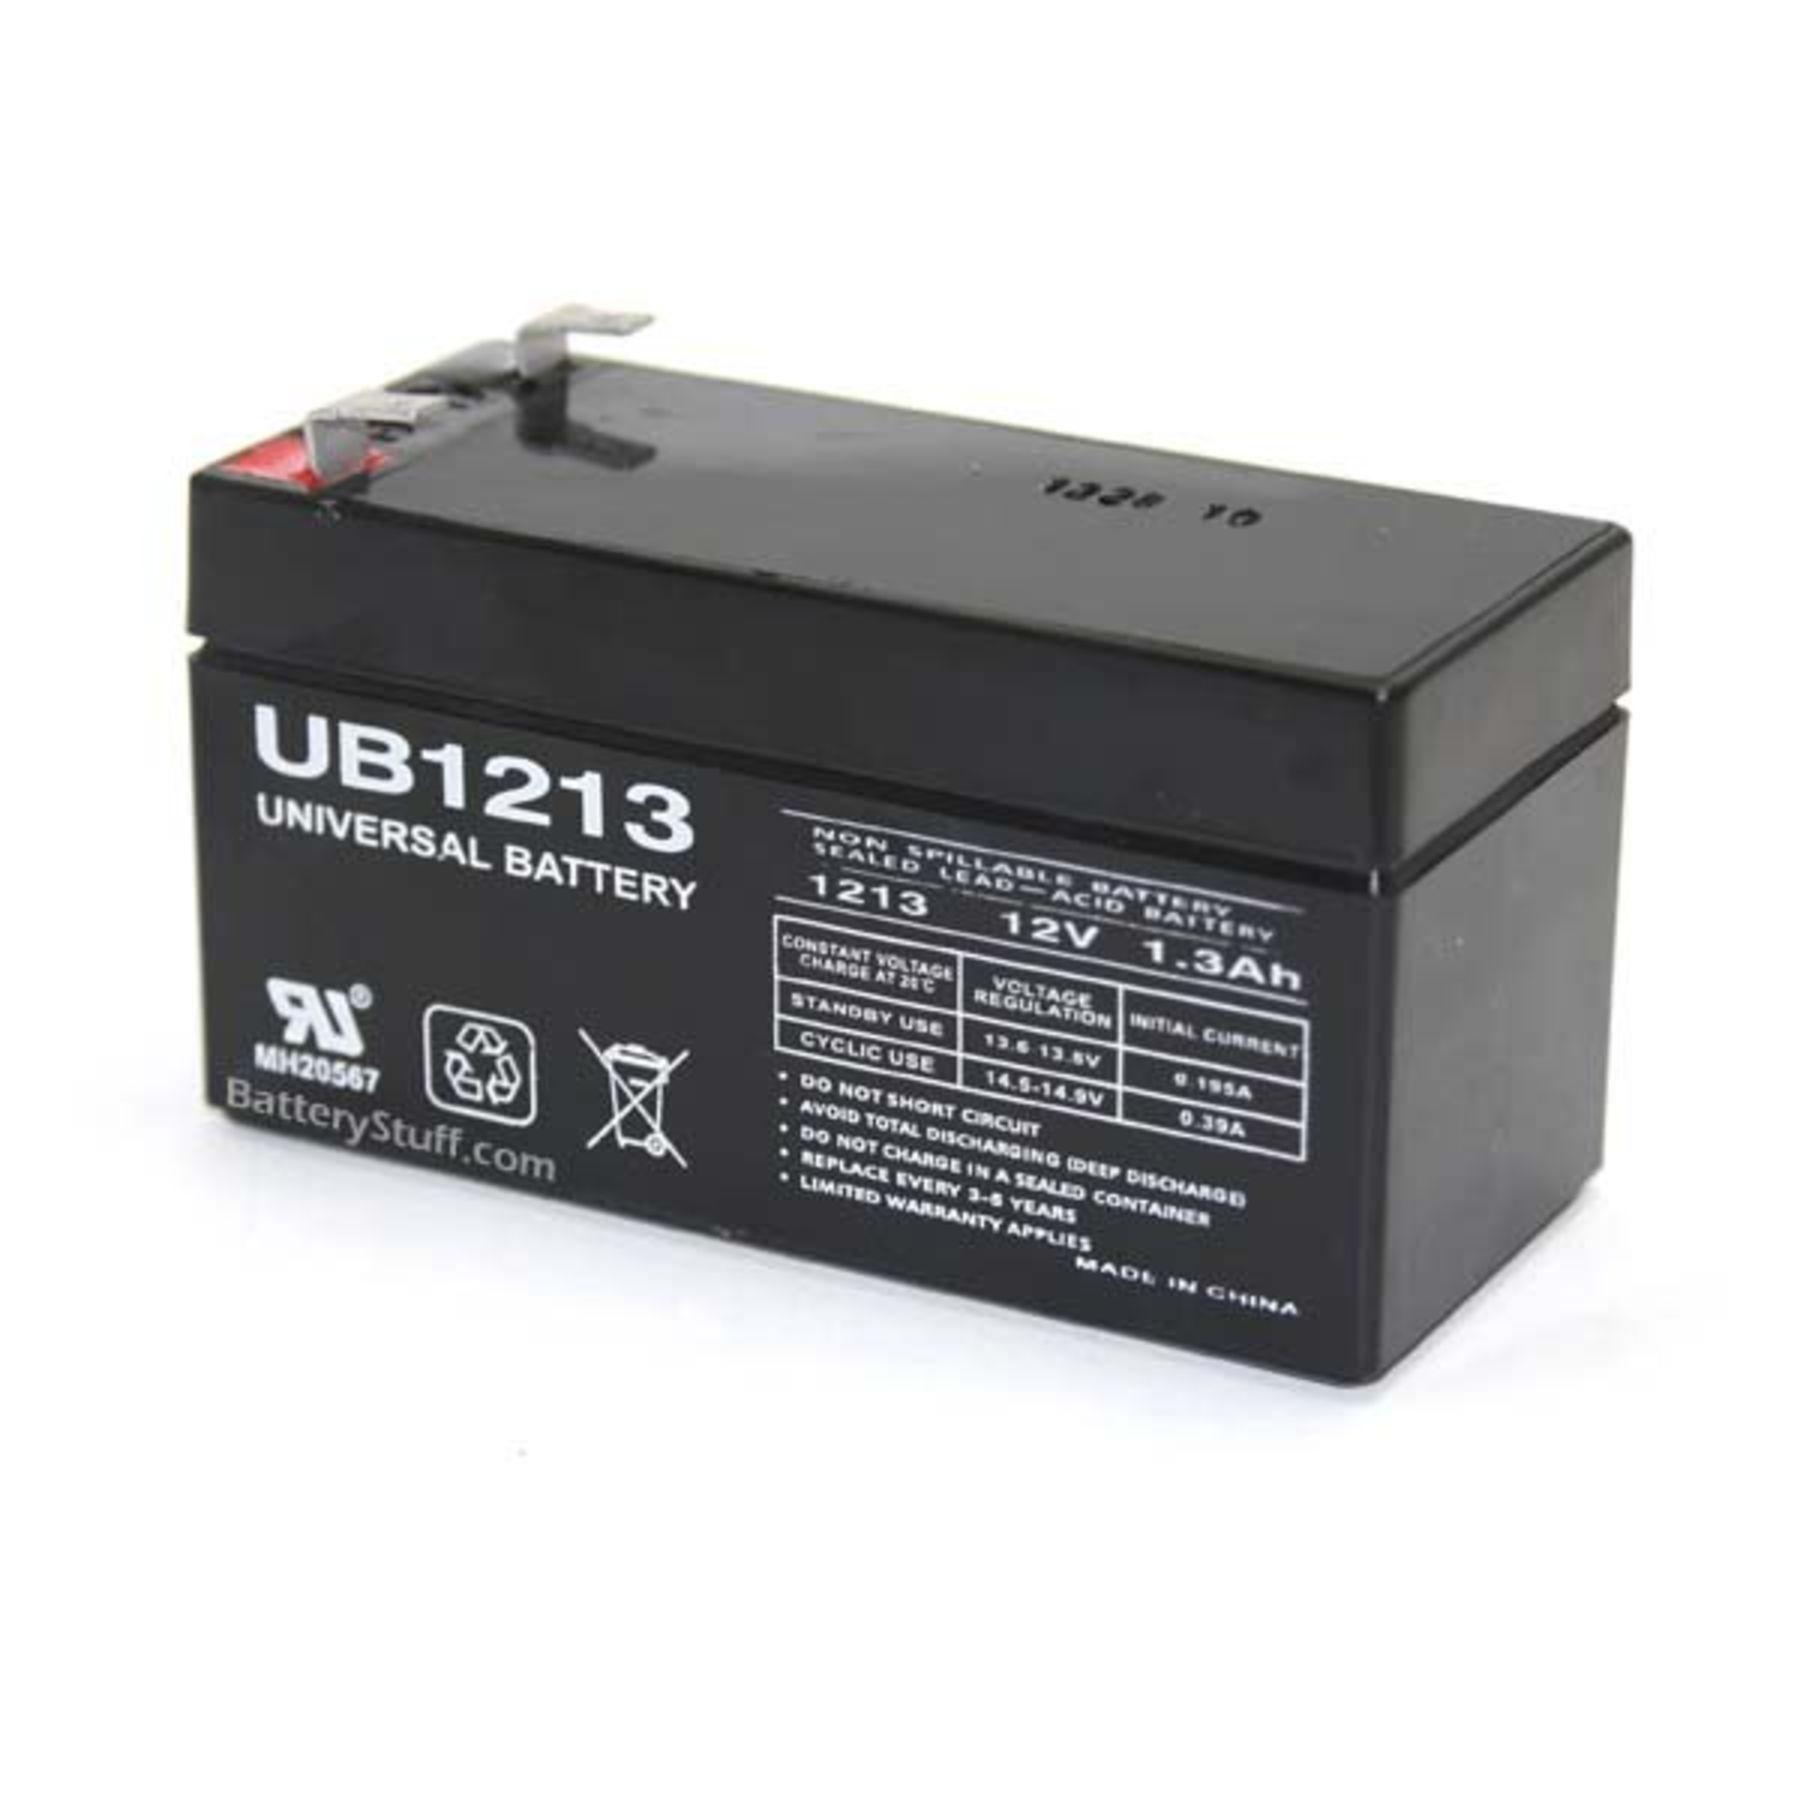 Sla 1213 Universal Battery 12v 13 Ah Sealed Ub1213 Sealedleadacid Charger Circuits